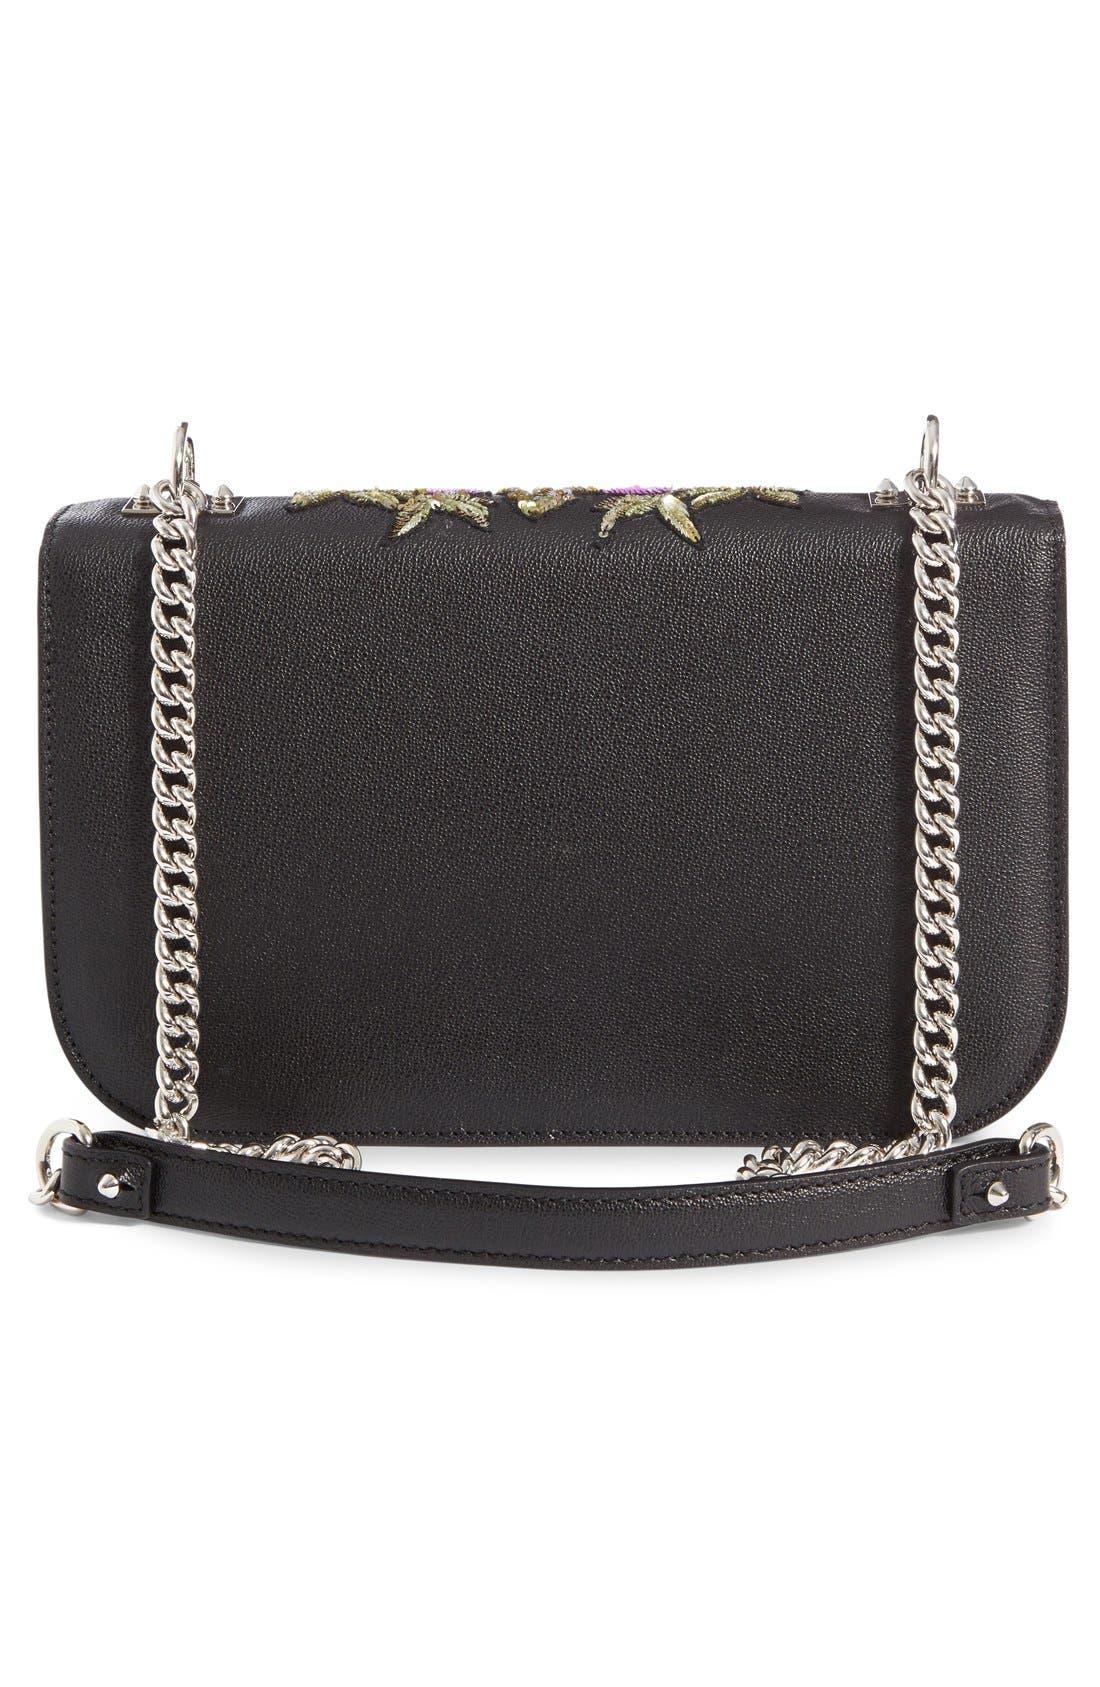 Alternate Image 3  - Alexander McQueen Medium Insignia Calfskin Leather Shoulder Bag